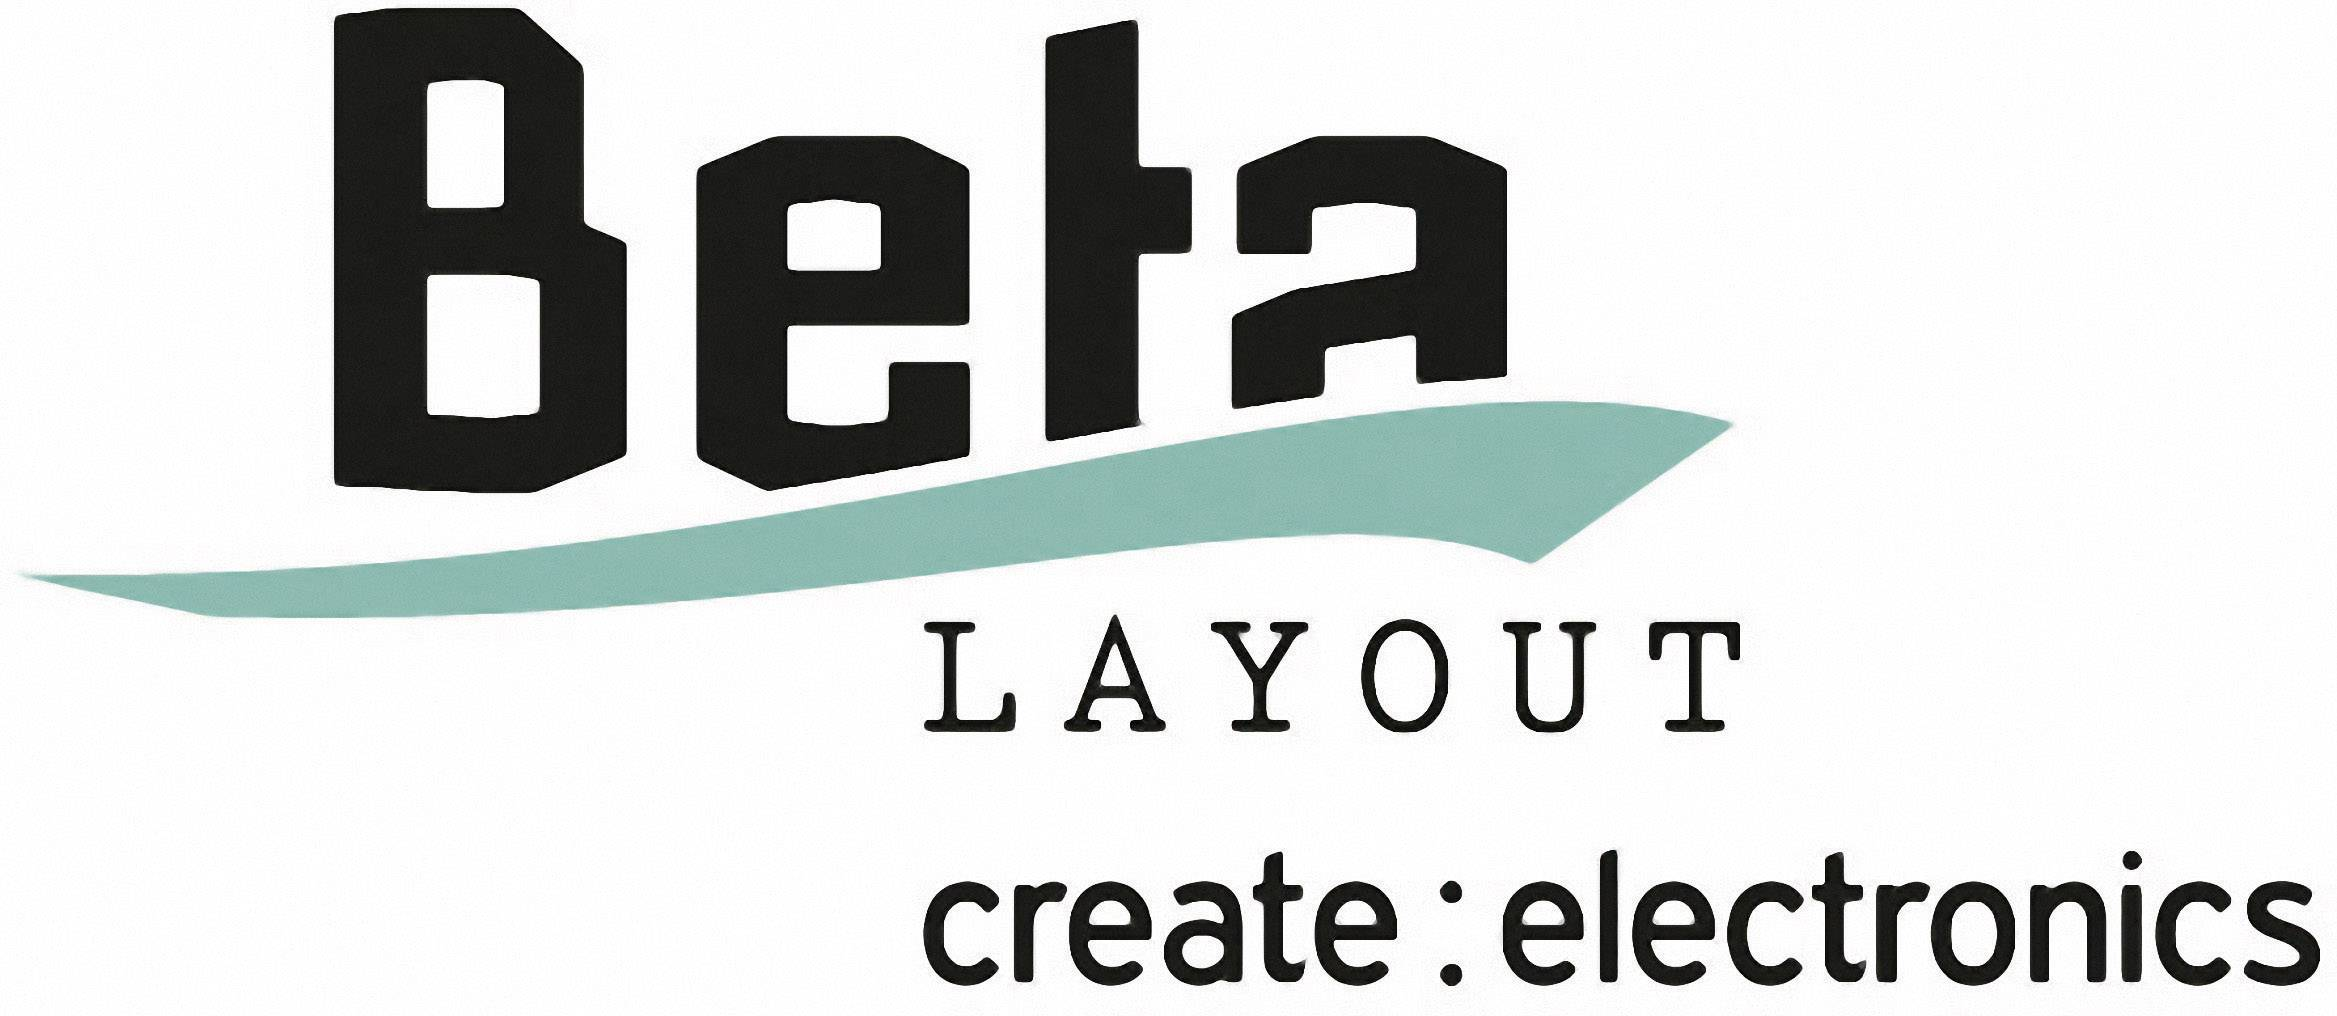 BETA Layout